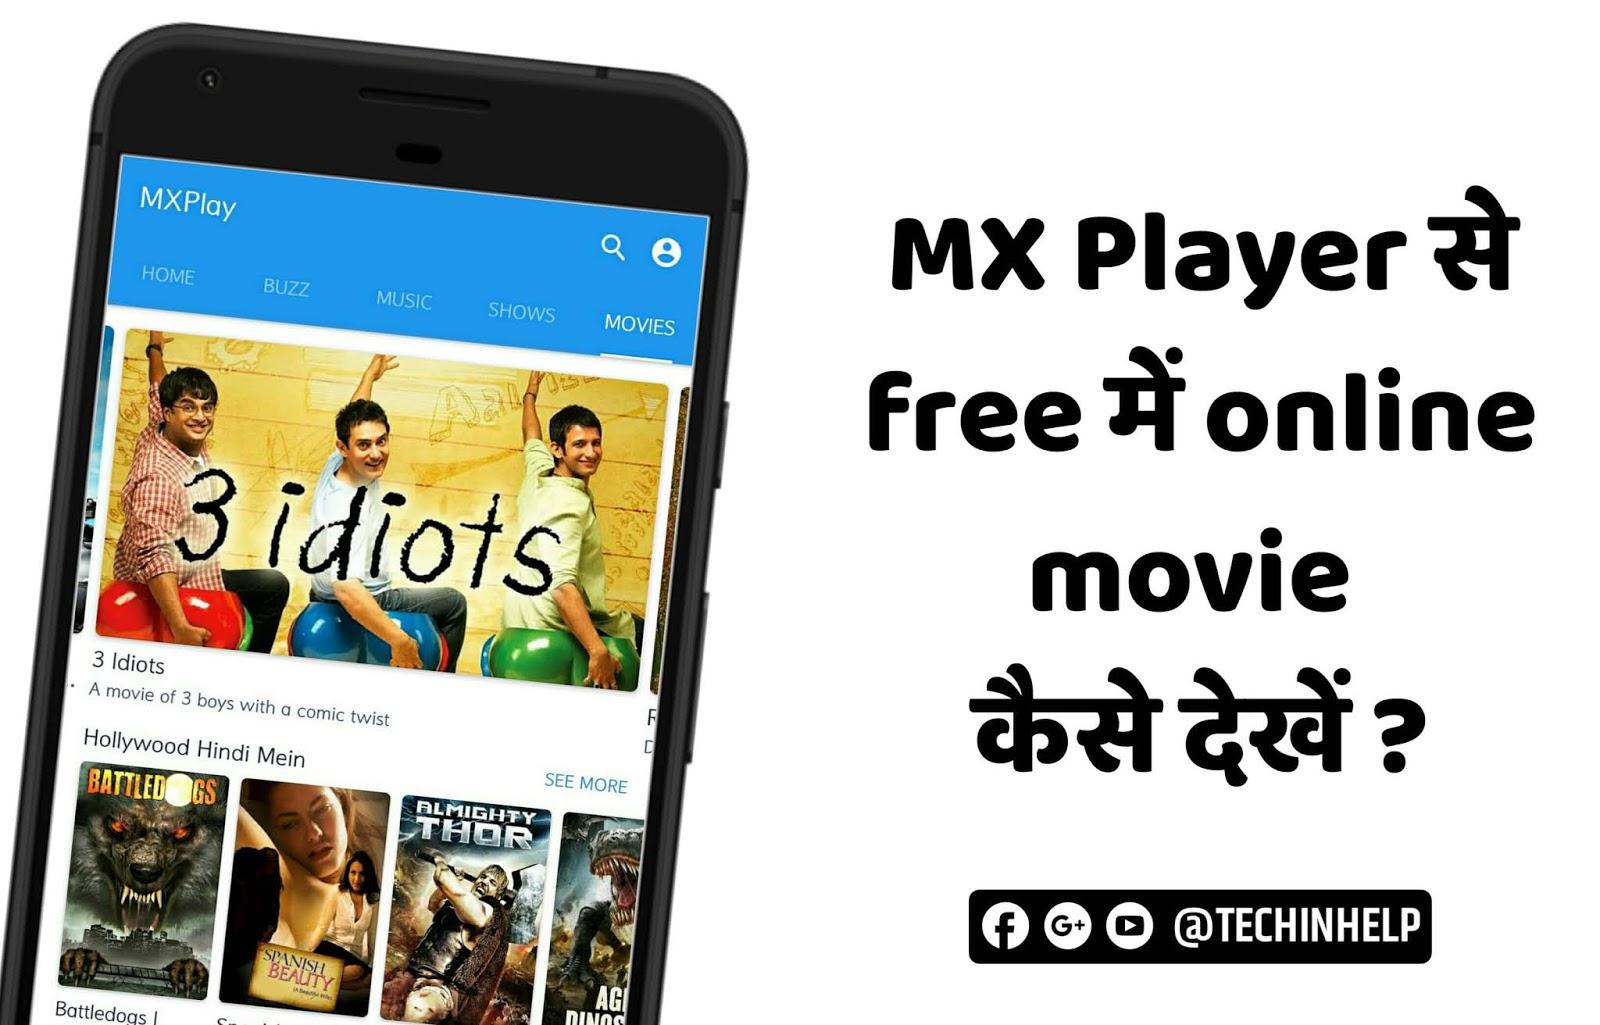 mx-player-se-online-movie-dekhe